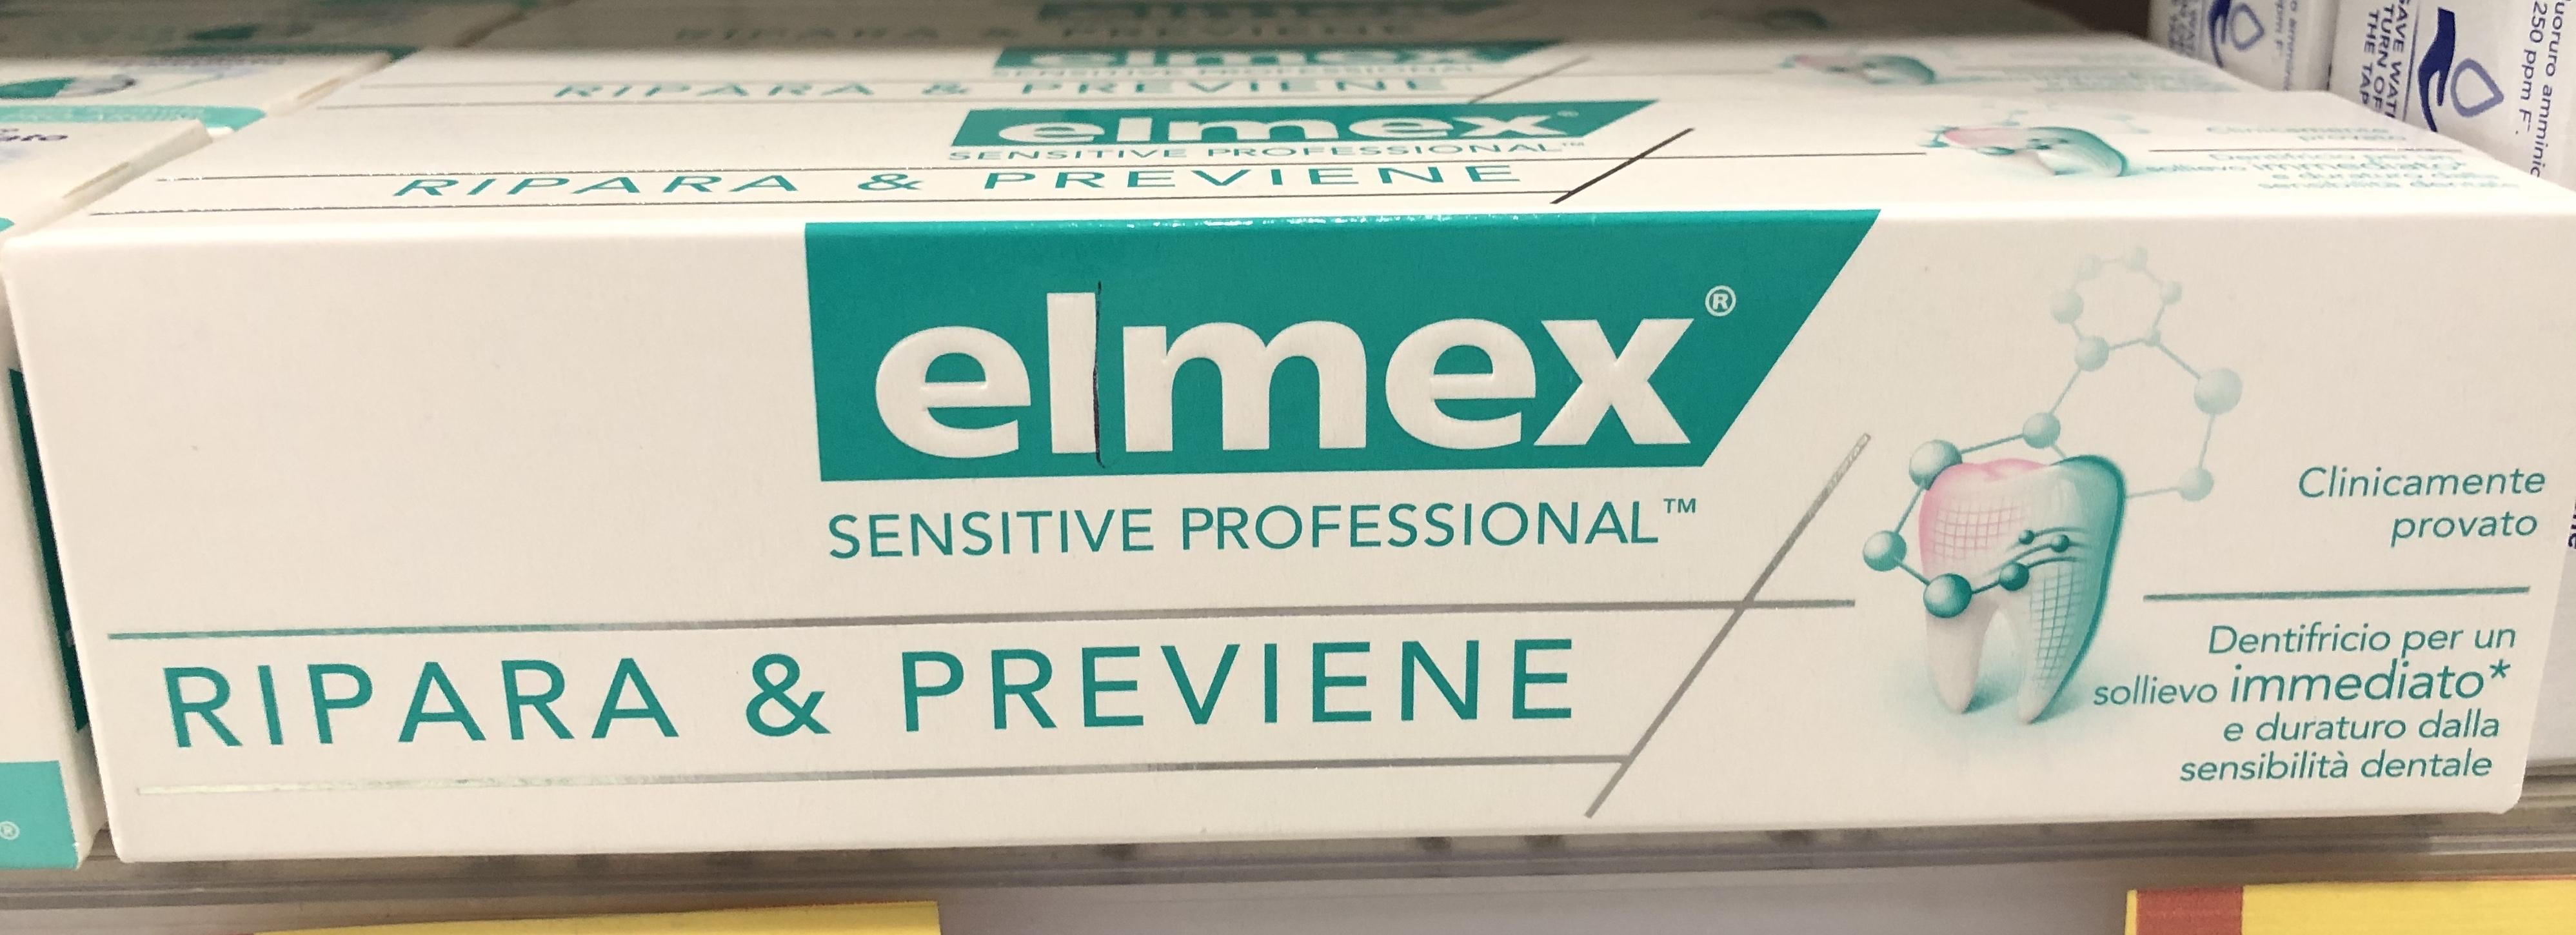 Elmex Sensitive Professional Ripara & Previene 75 ml